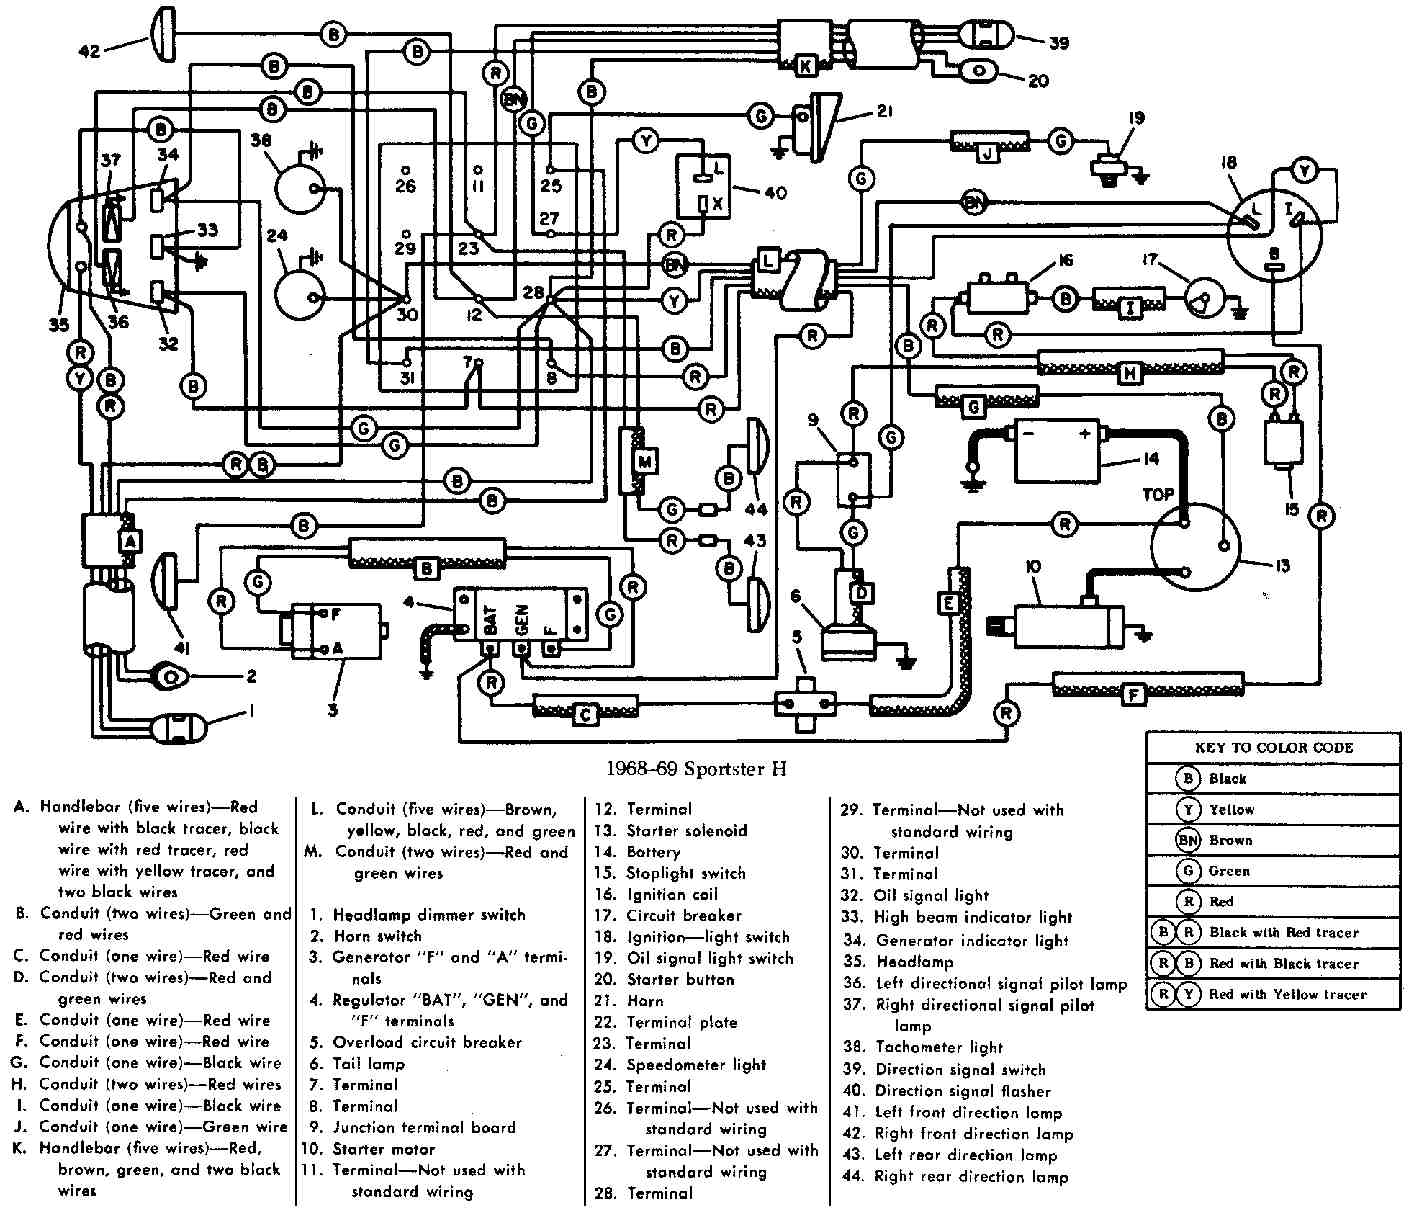 2014 sportster wiring diagram 1977 harley davidson sportster wiring diagram all motorcycle  1977 harley davidson sportster wiring